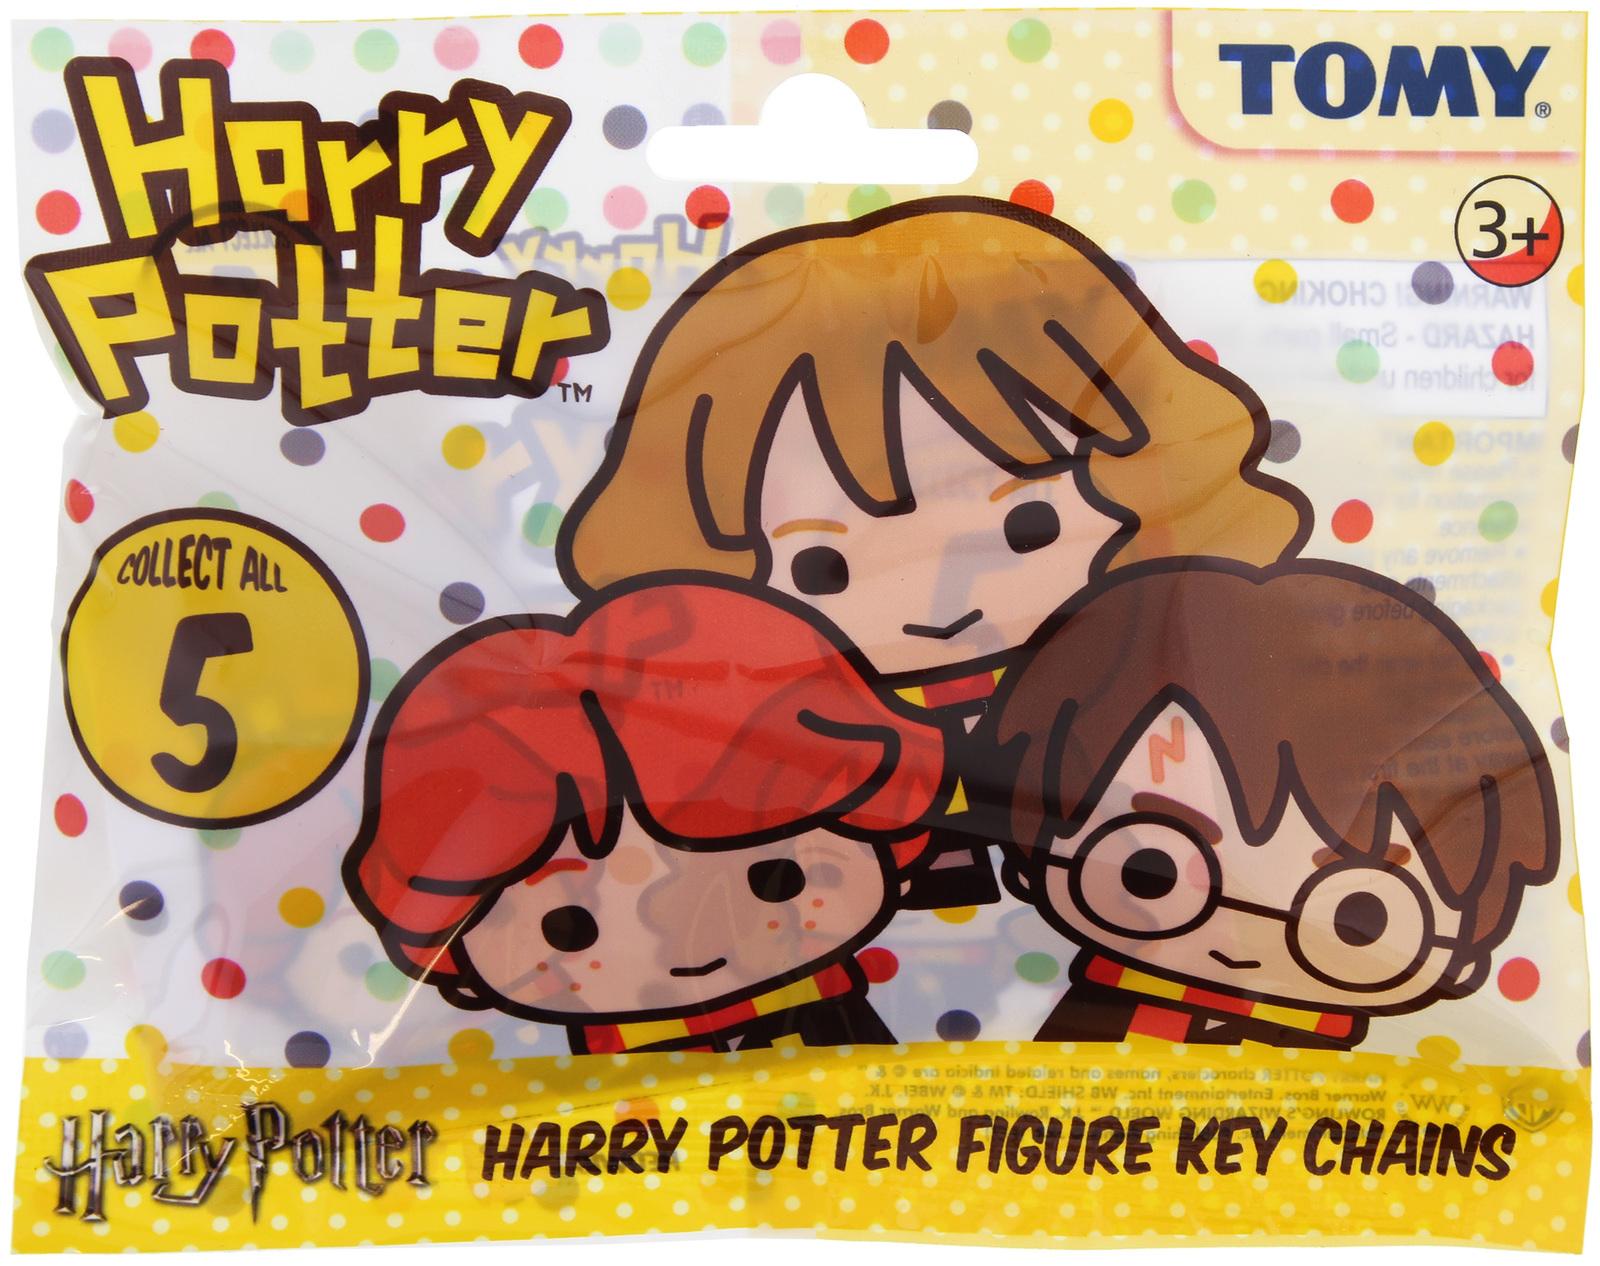 Harry Potter - Keychain Figure (Assorted Designs) image